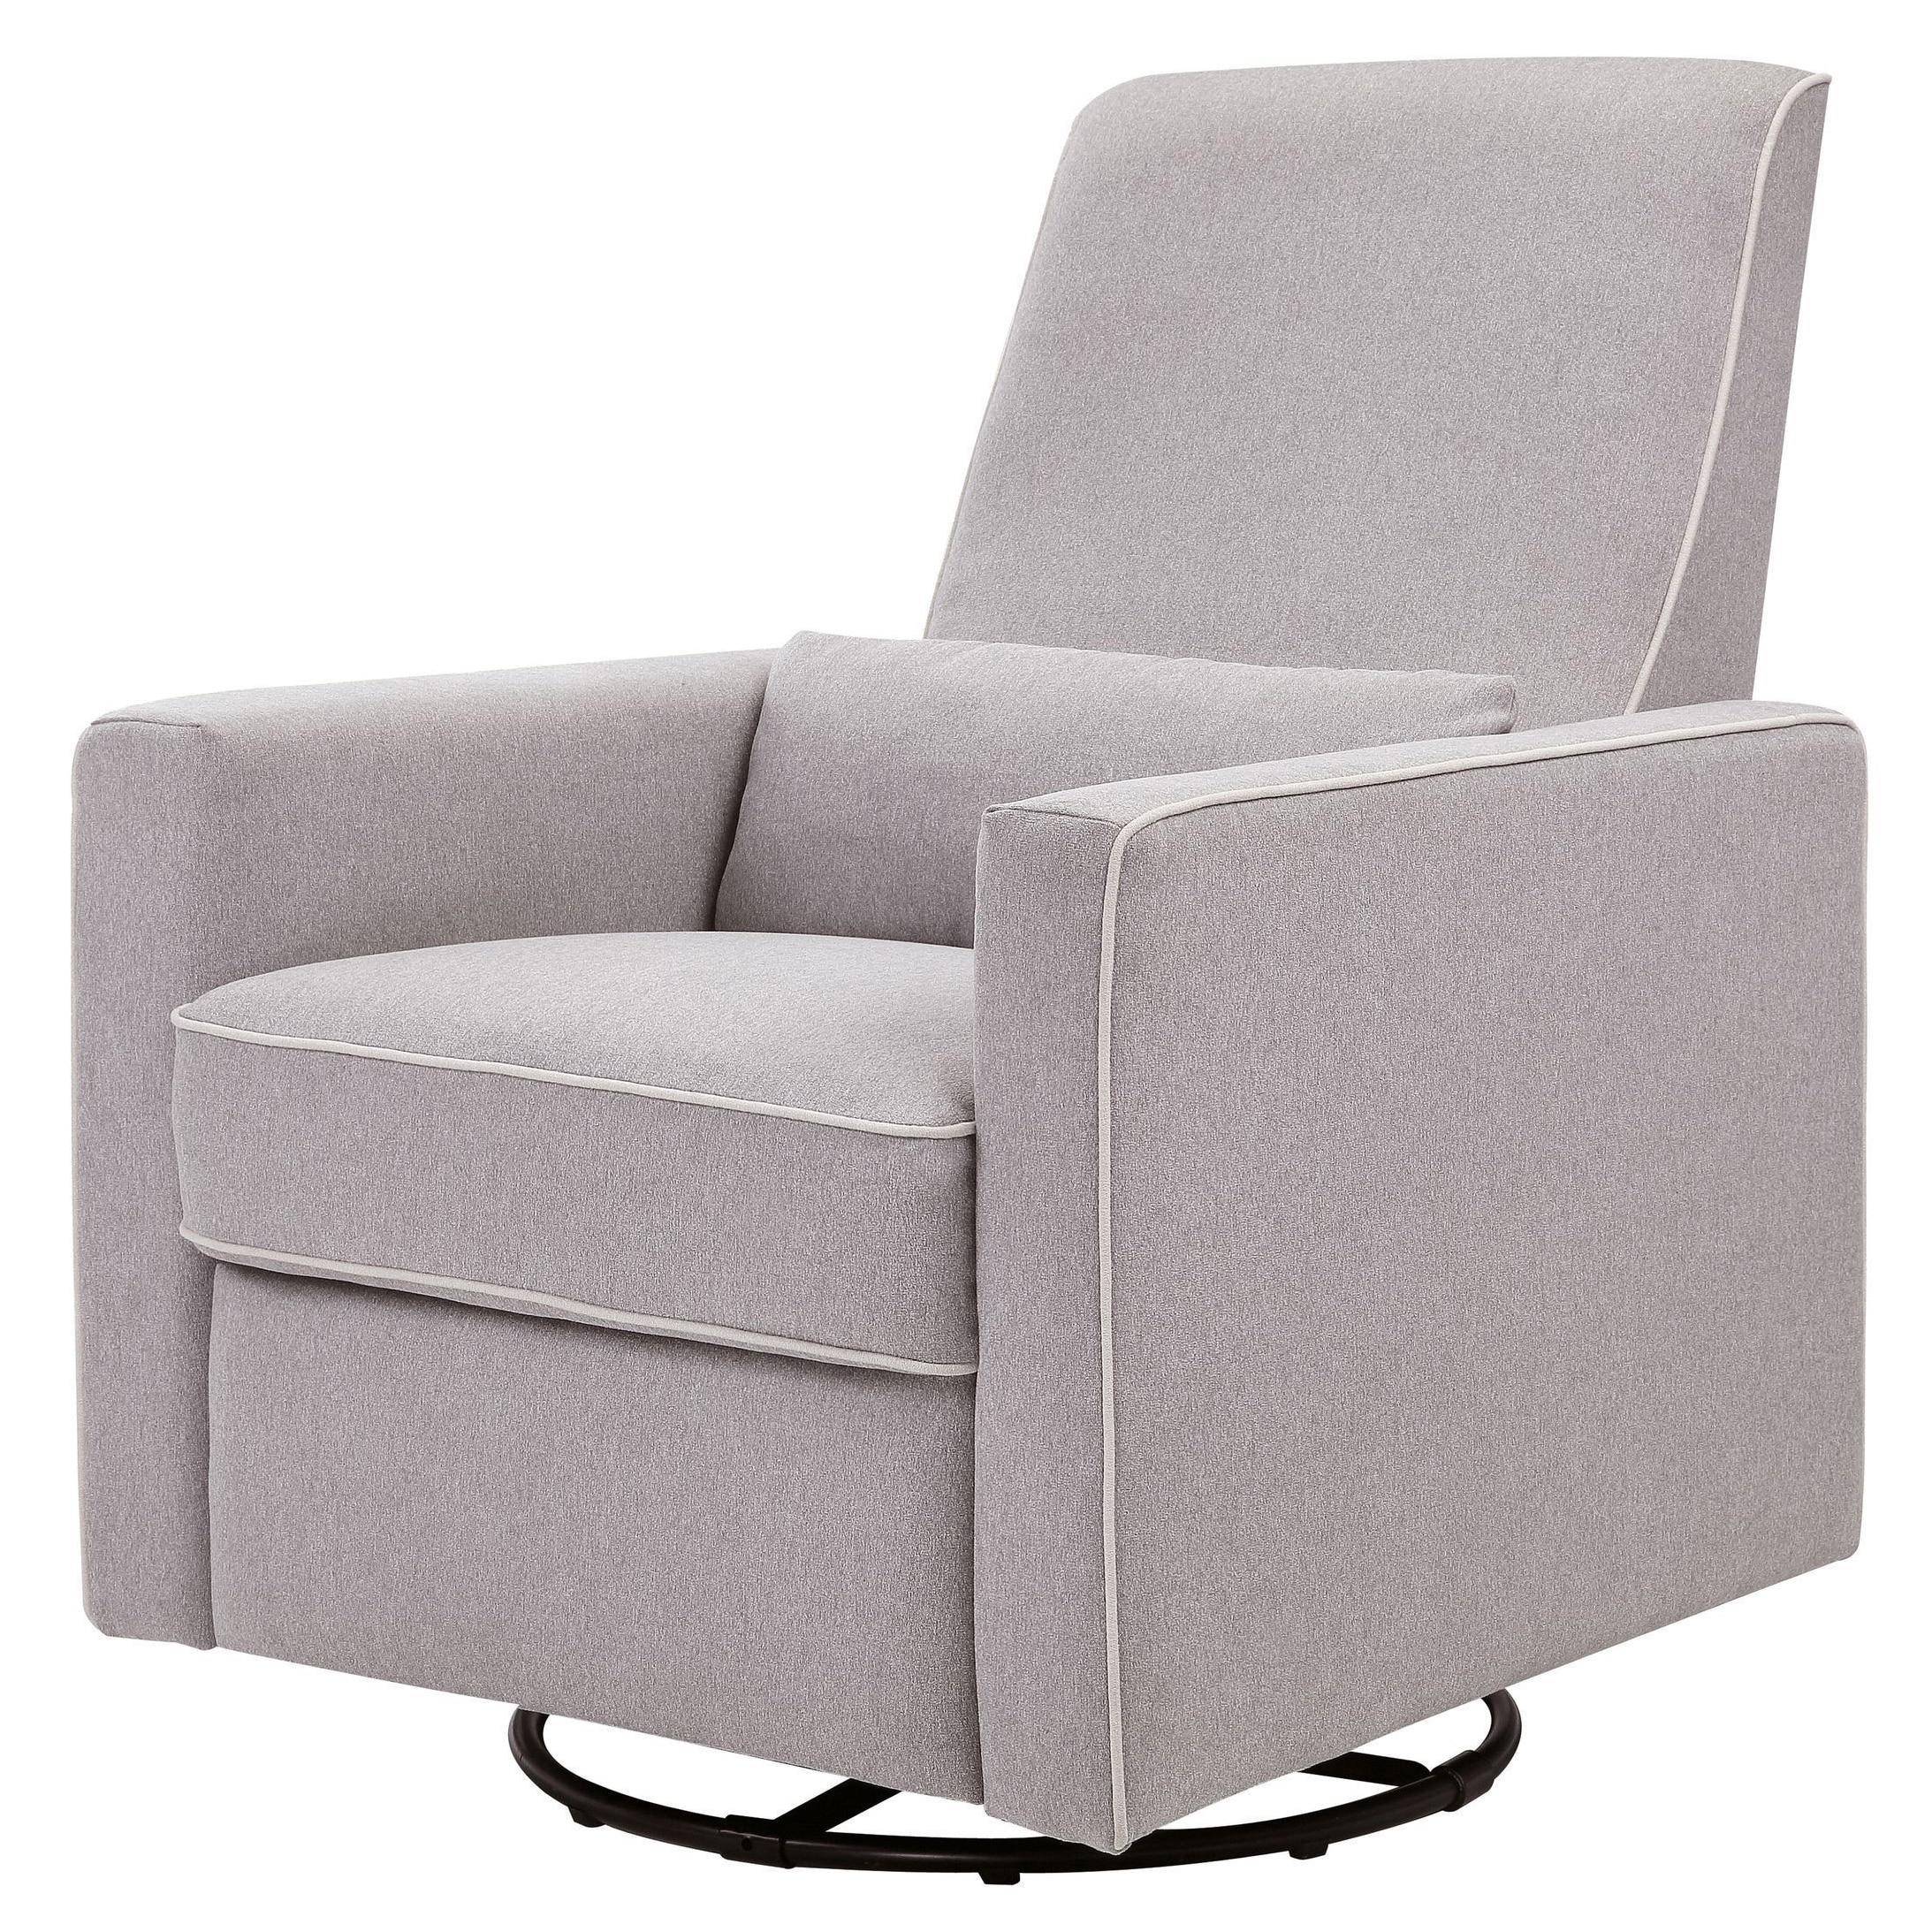 DaVinci Piper All Purpose Upholsterd Recliner